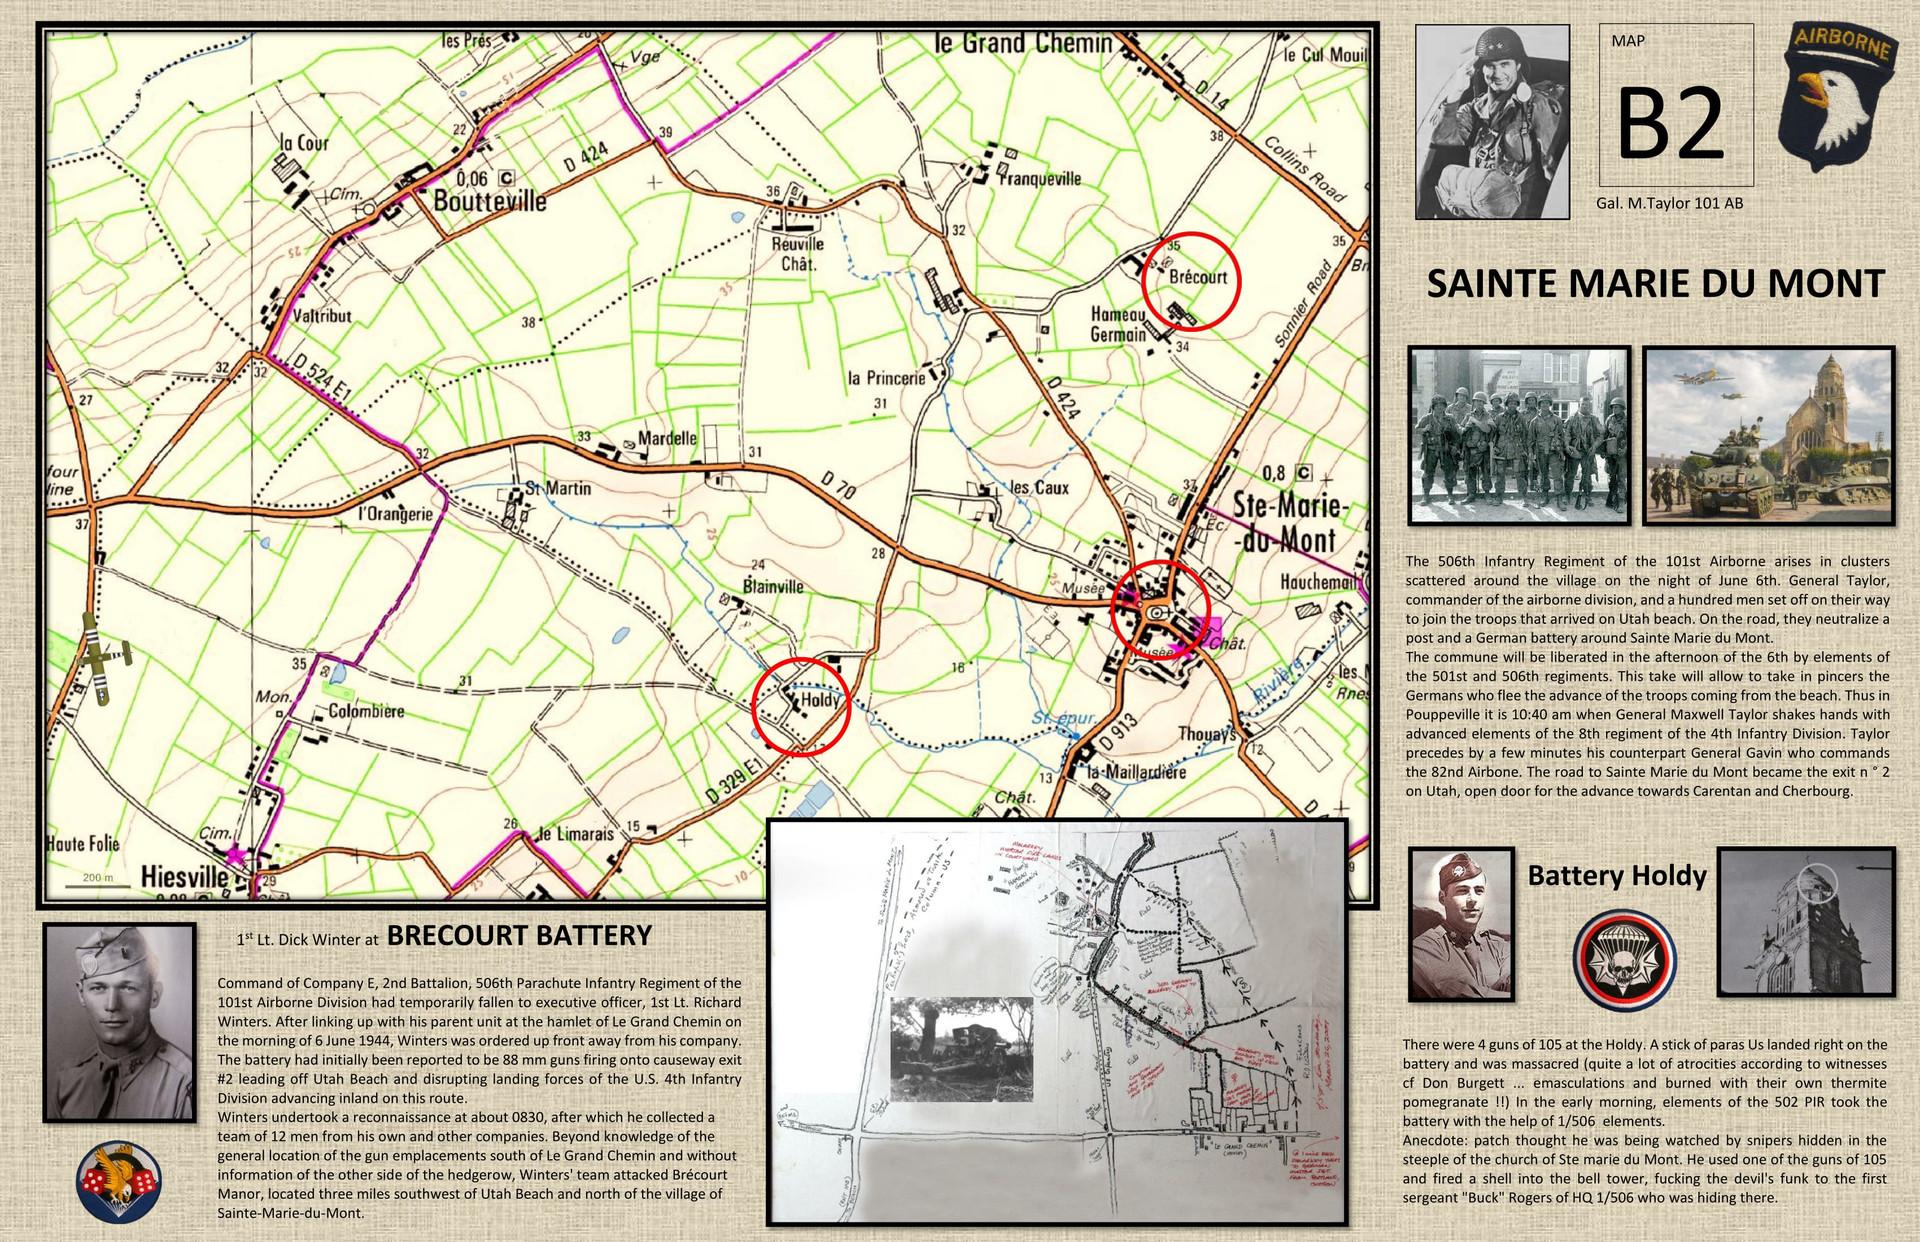 map B2 st marie du mont-1.jpg